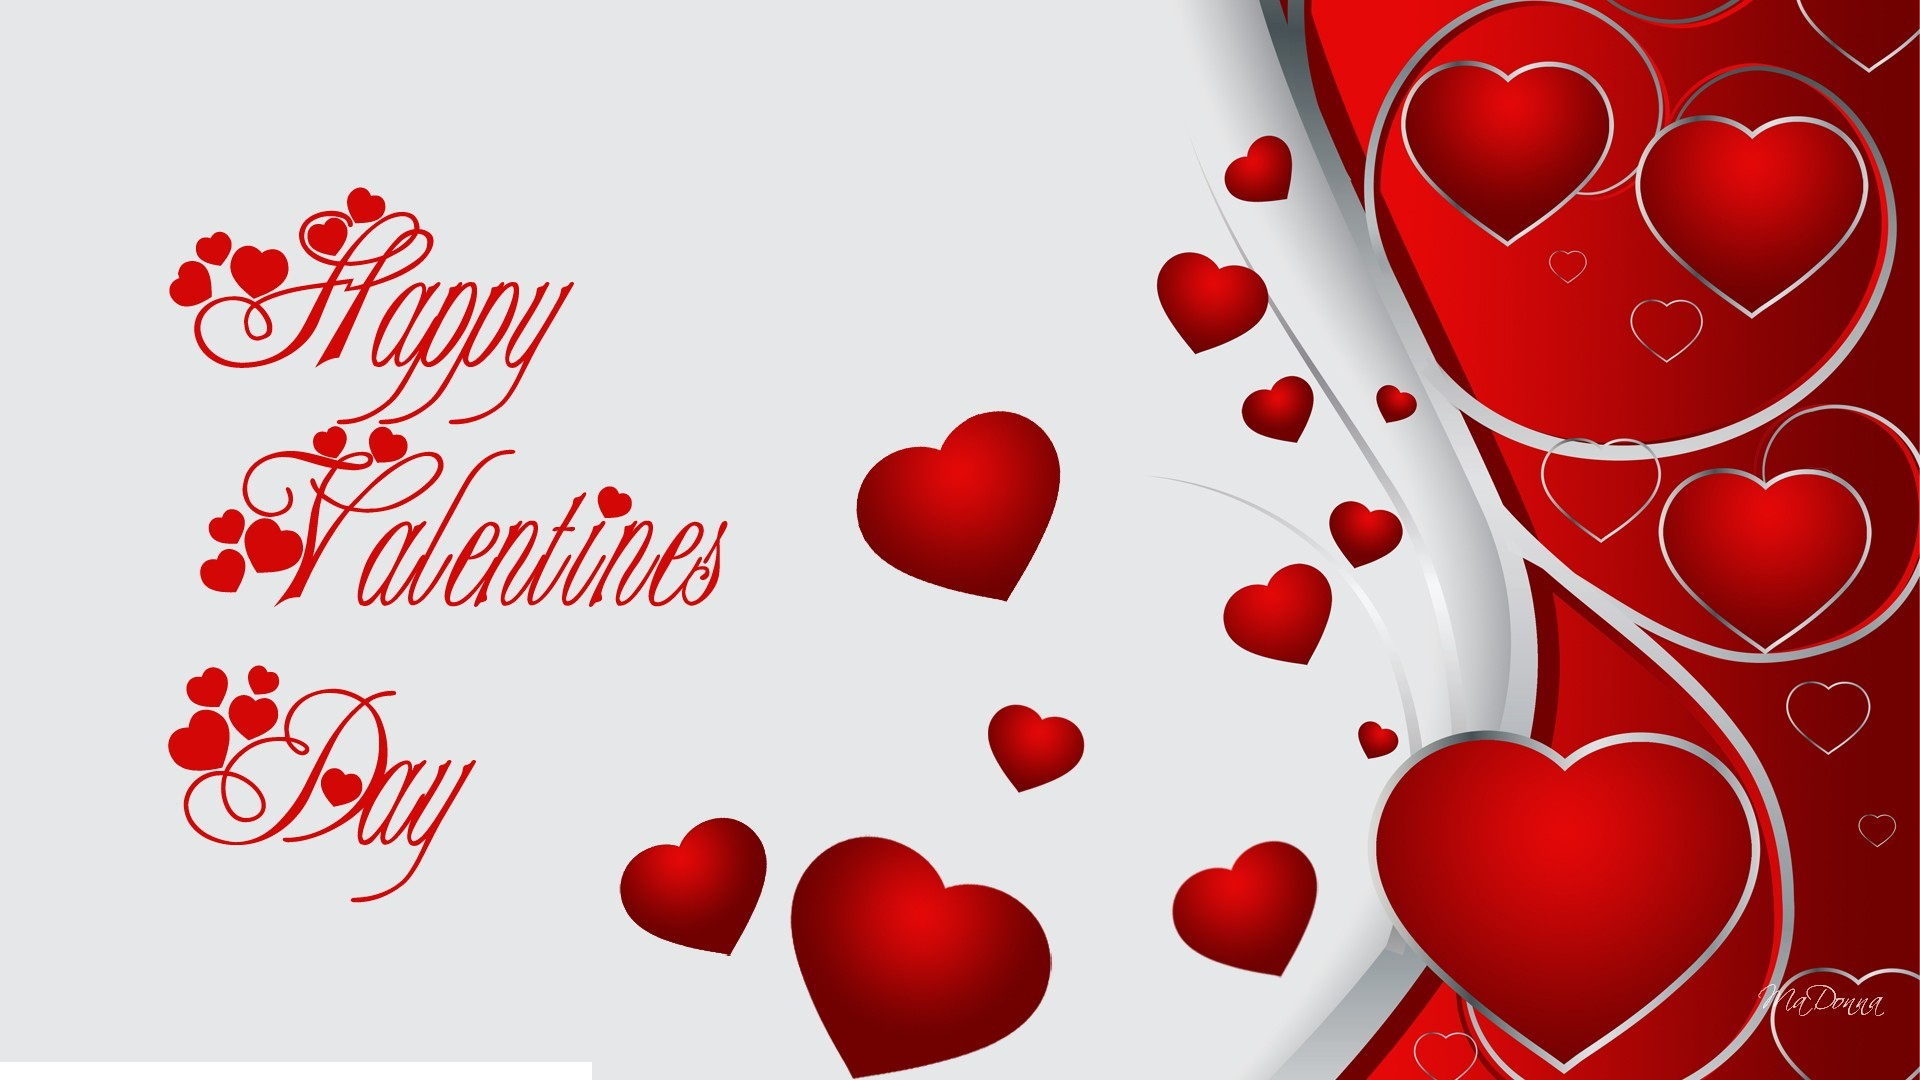 Happy Valentines Day Wallpaper Wallpapertag